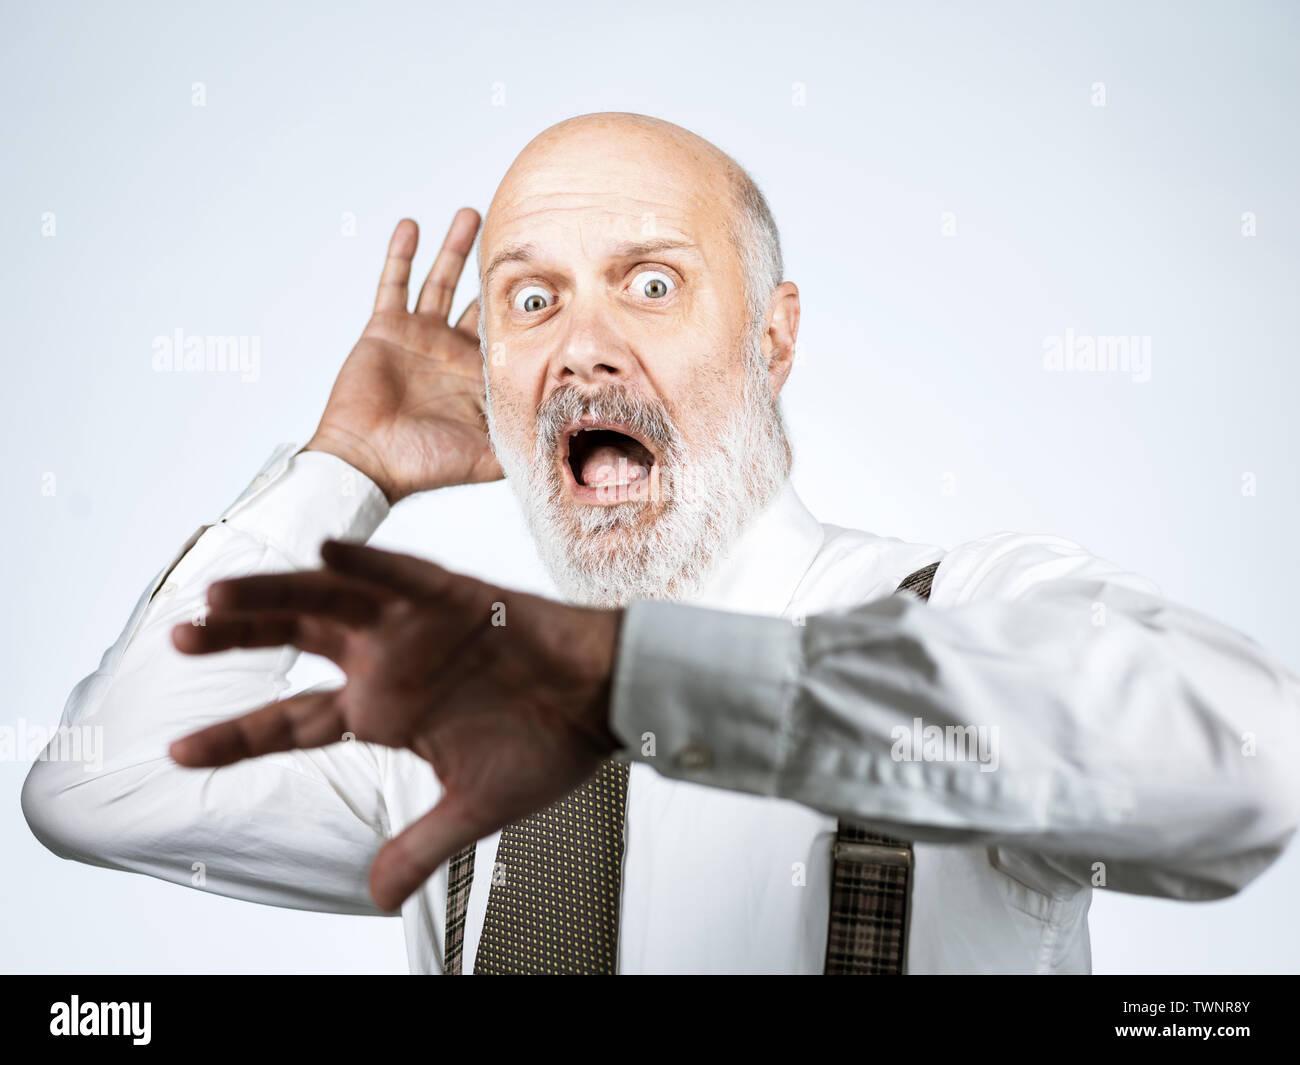 Angst Panik älterer Mann laut schreiend mit erhobenen Händen Stockbild